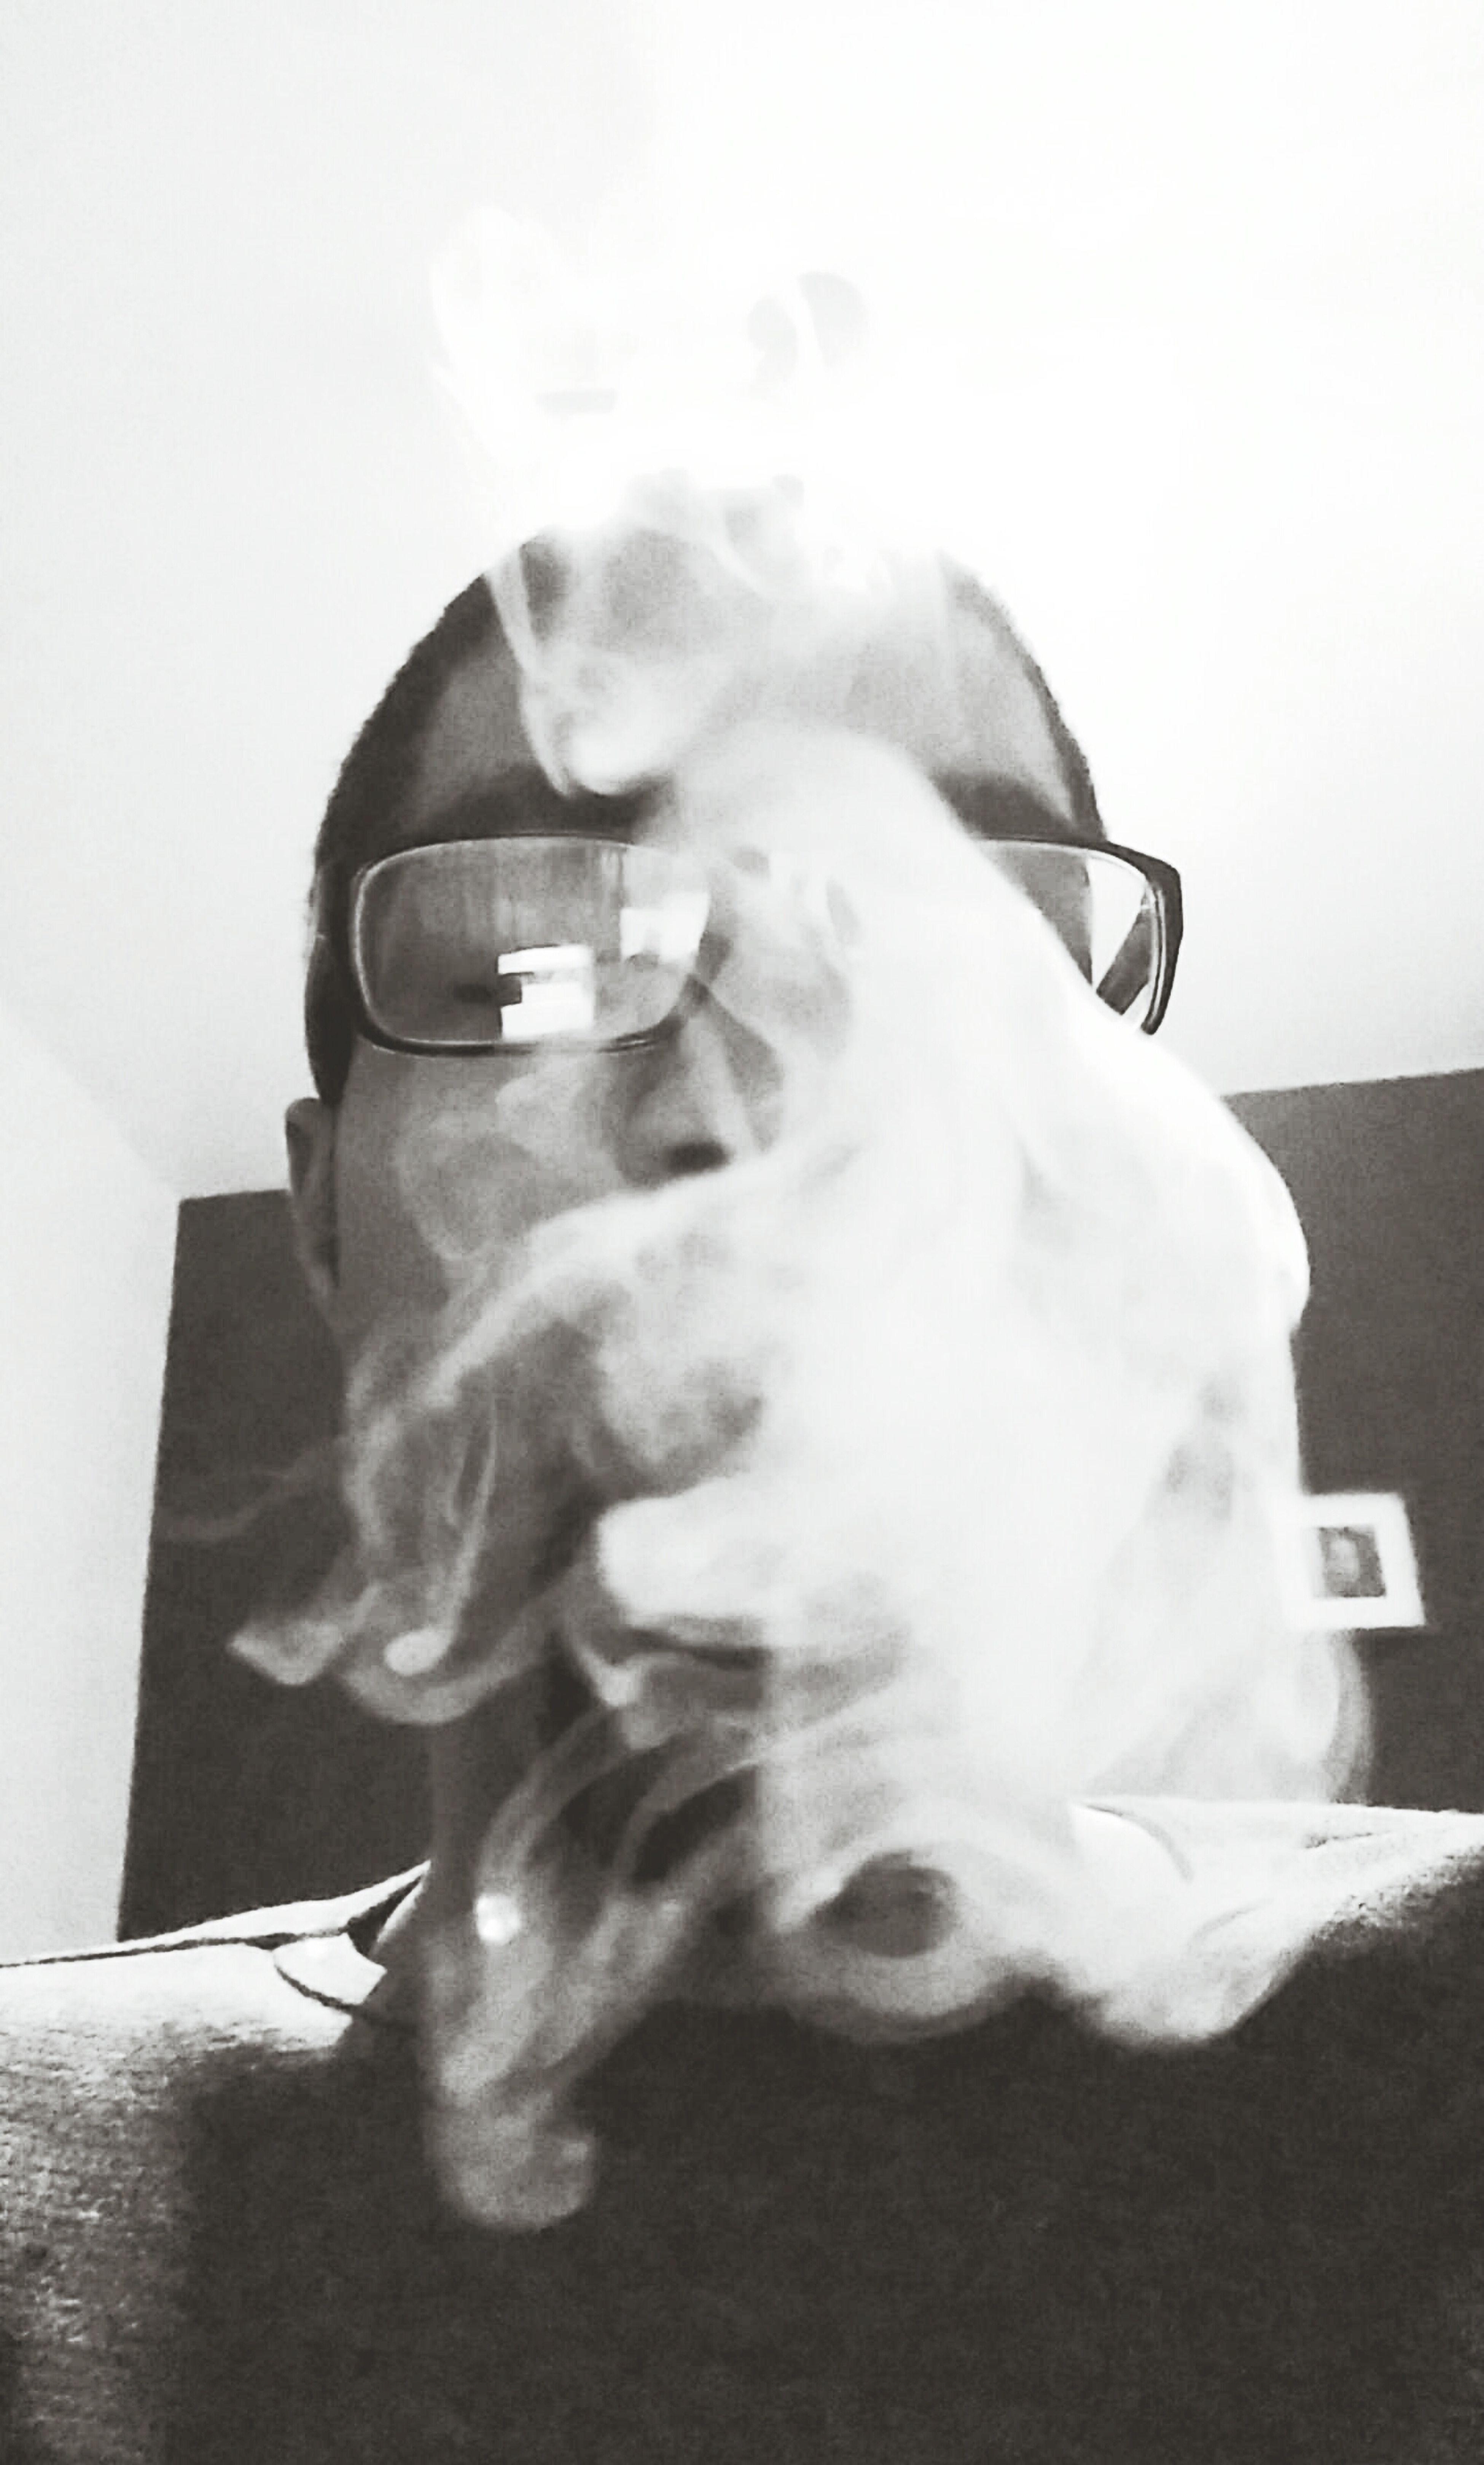 SMOKE WEED EVERYDAY Kool Life High Shyt First Eyeem Photo